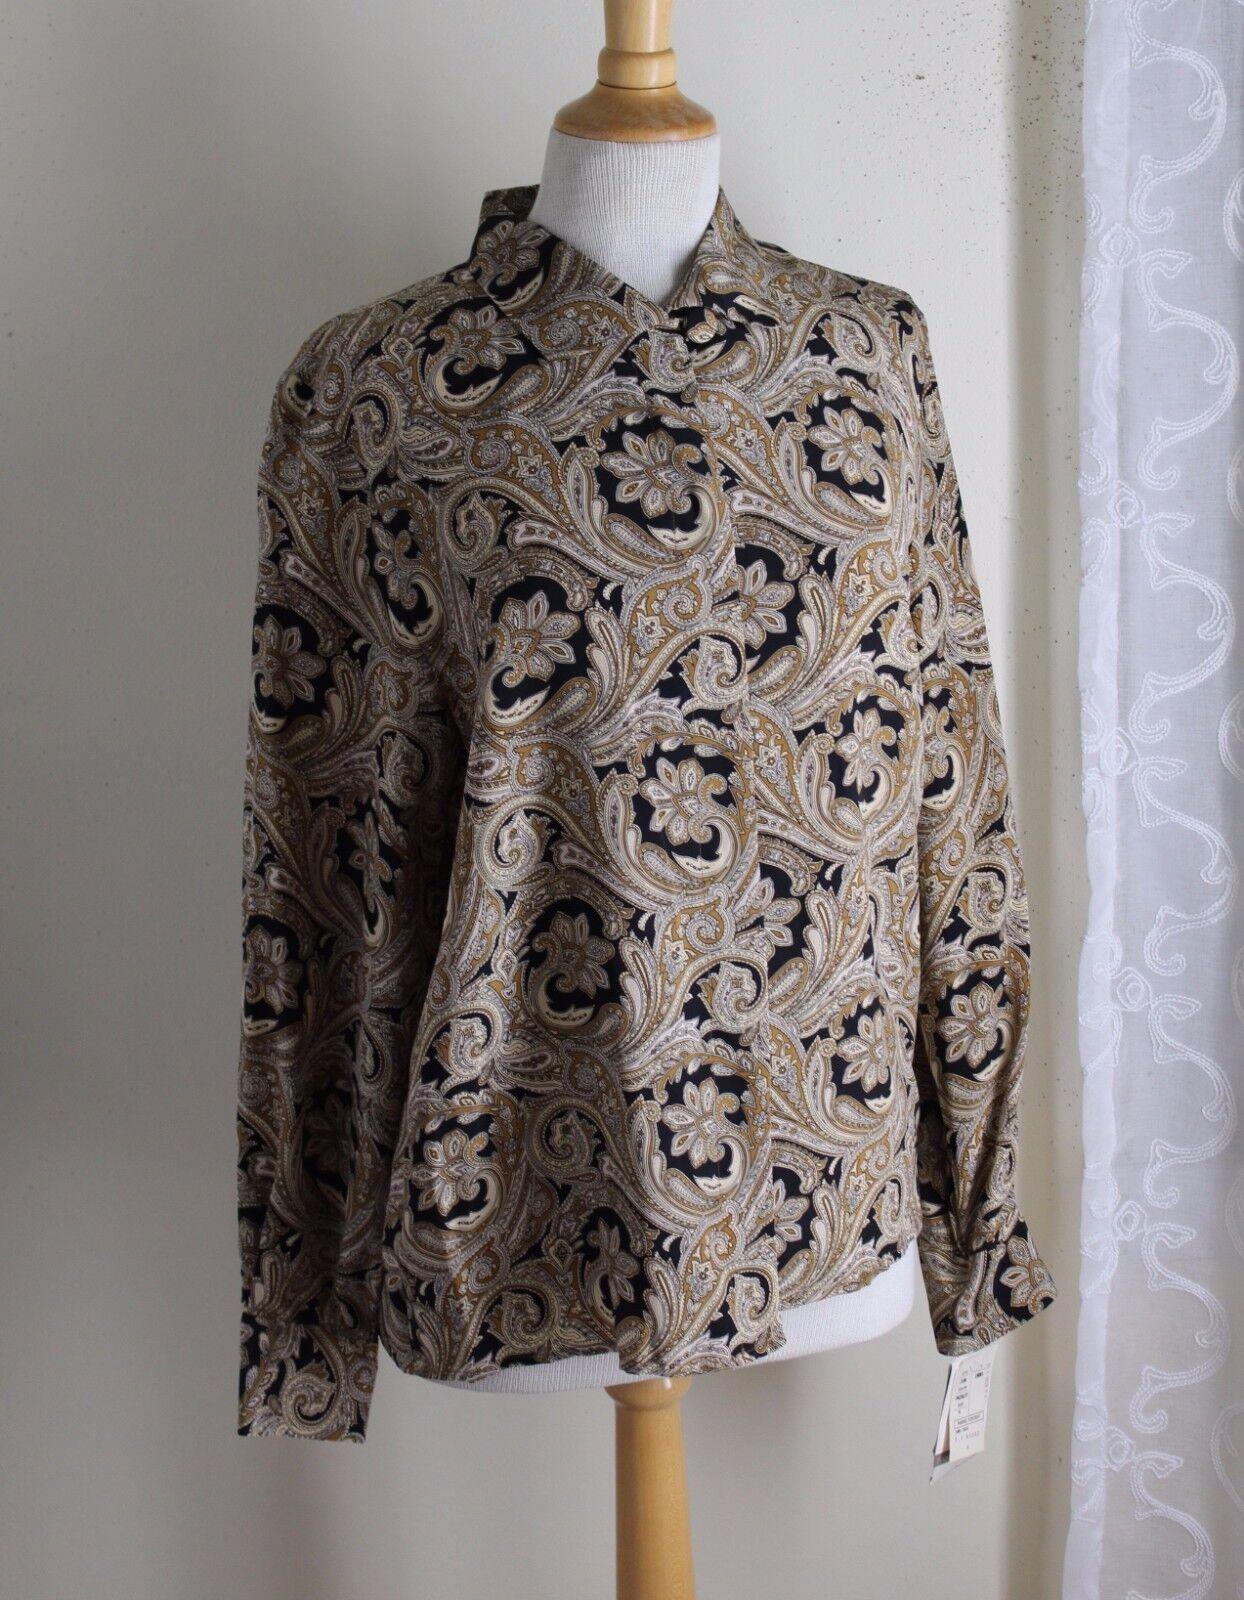 NWT Doncaster -Sz 4 Rich Elegant Art-to-Wear Silk Paisley Shirt Top Sz 4 S